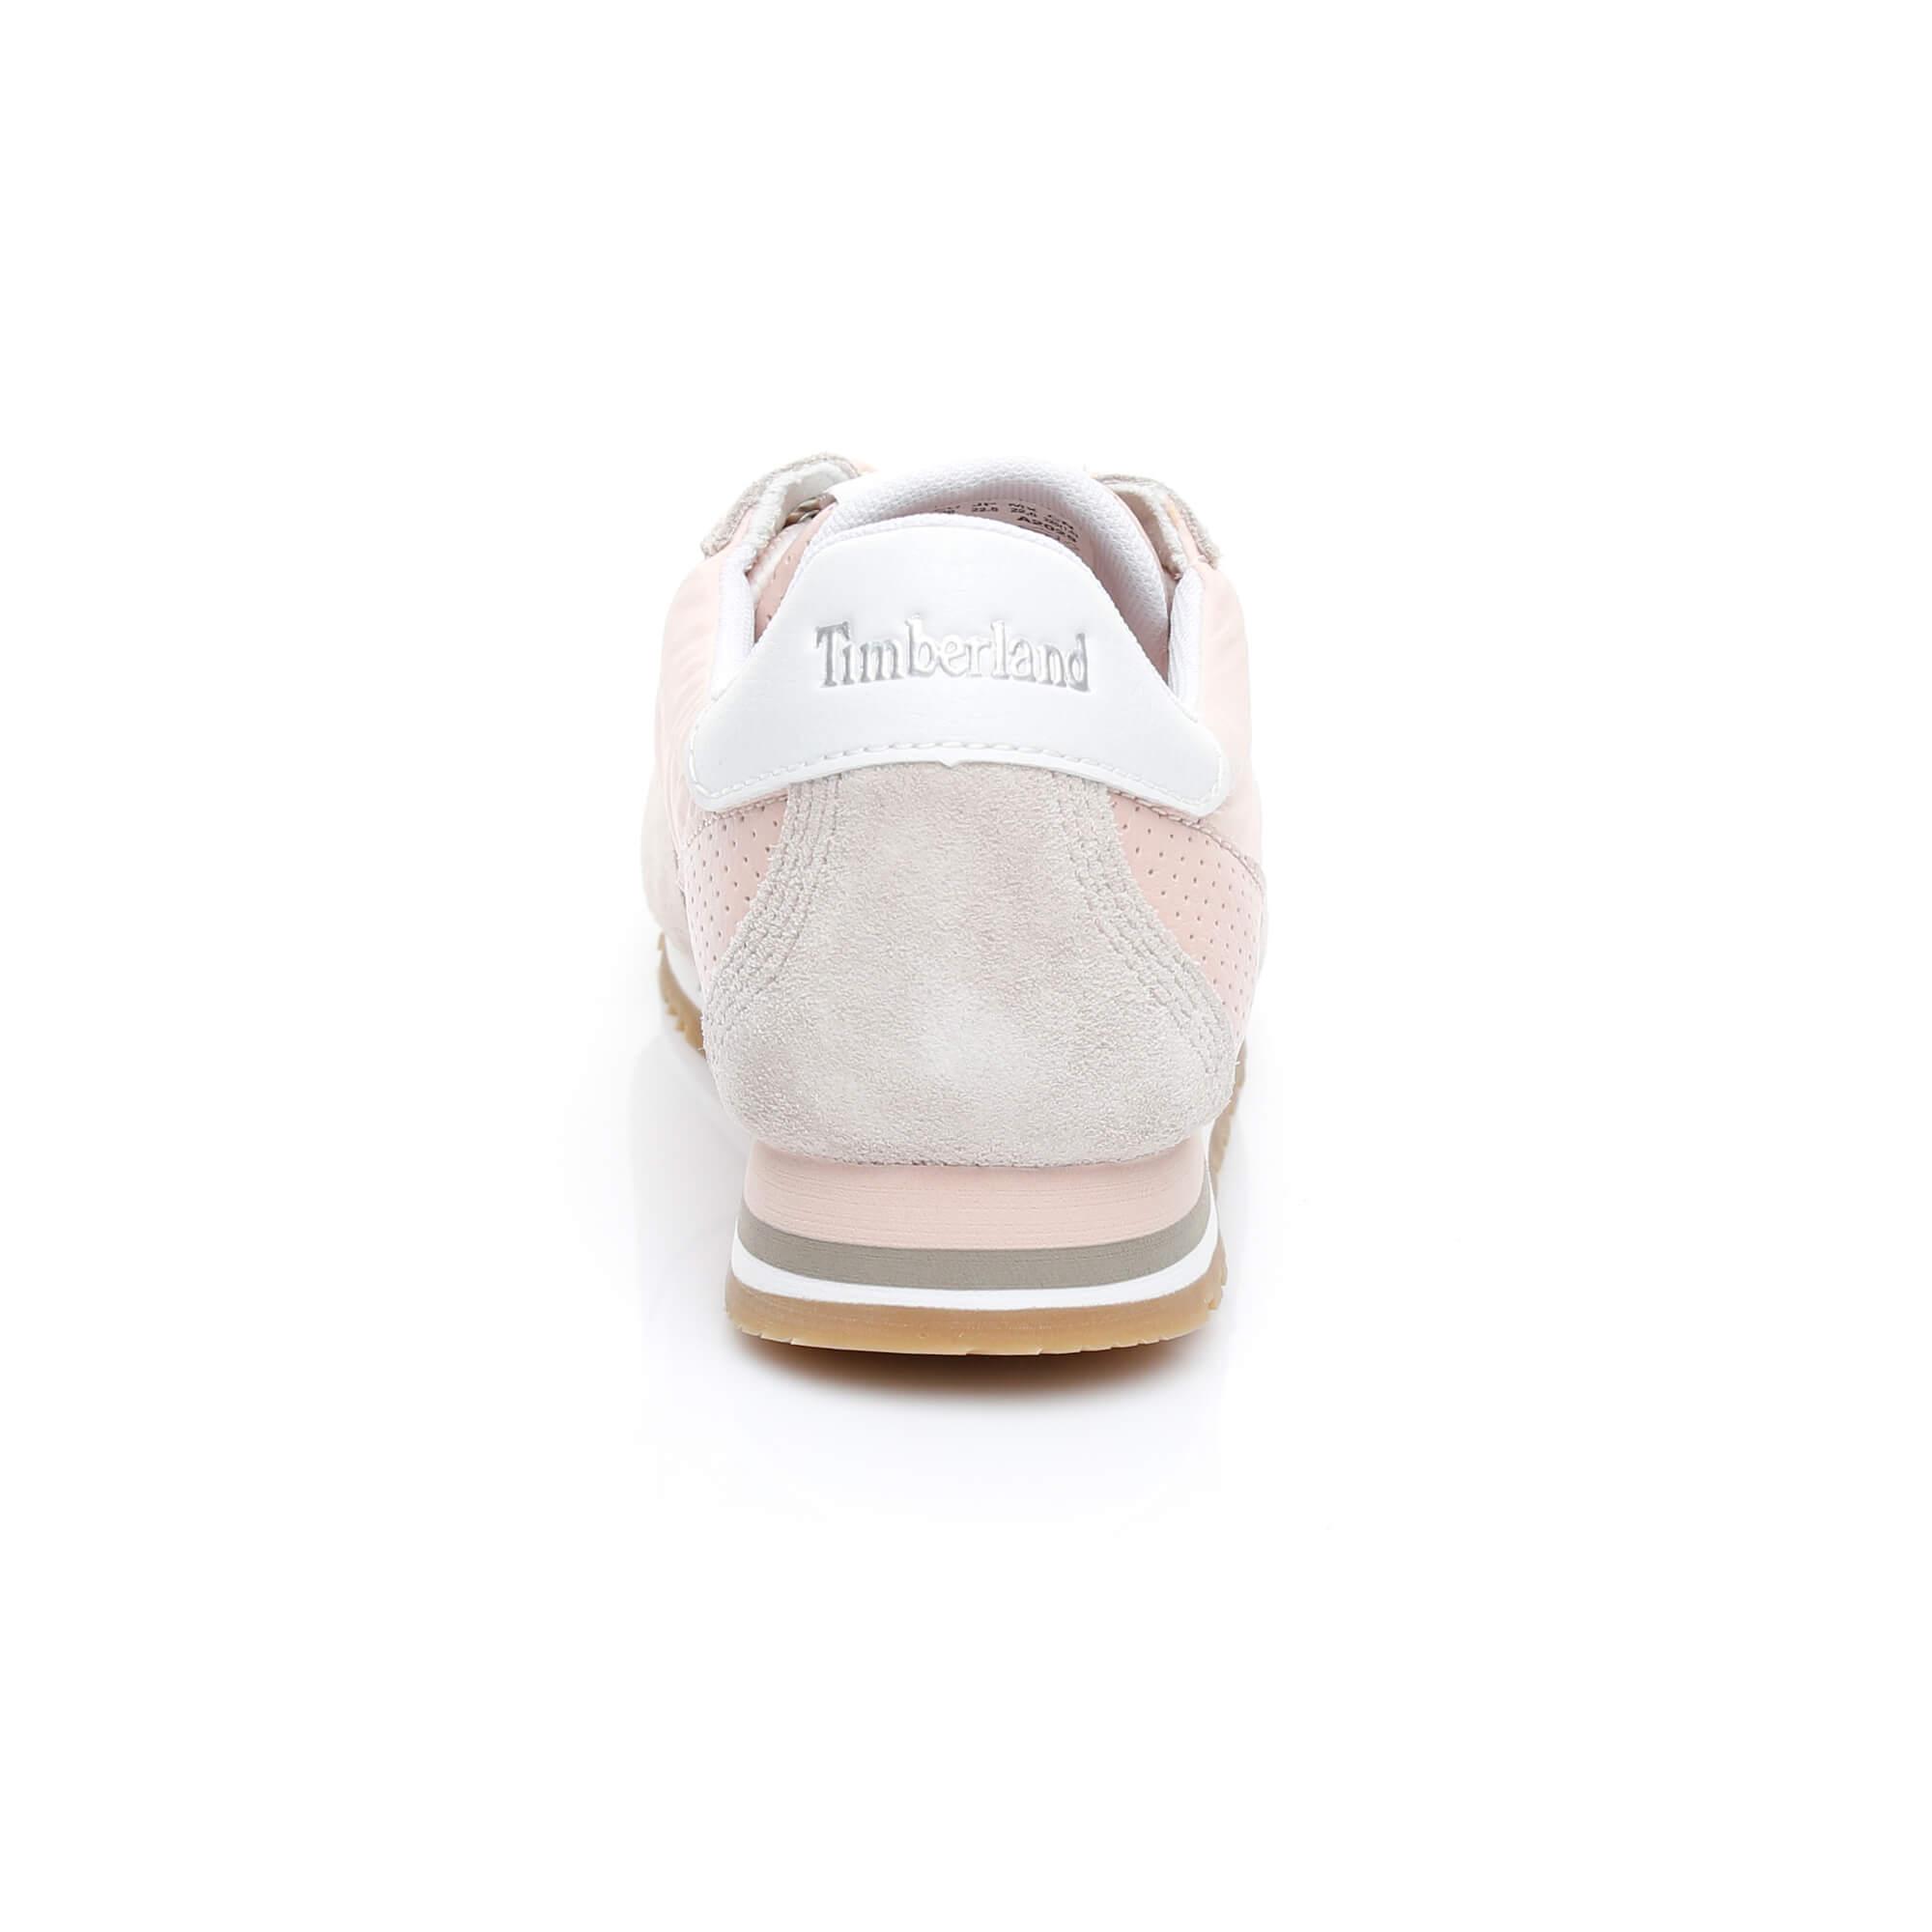 Timberland Milan Flavor Kadın Pembe Sneakers